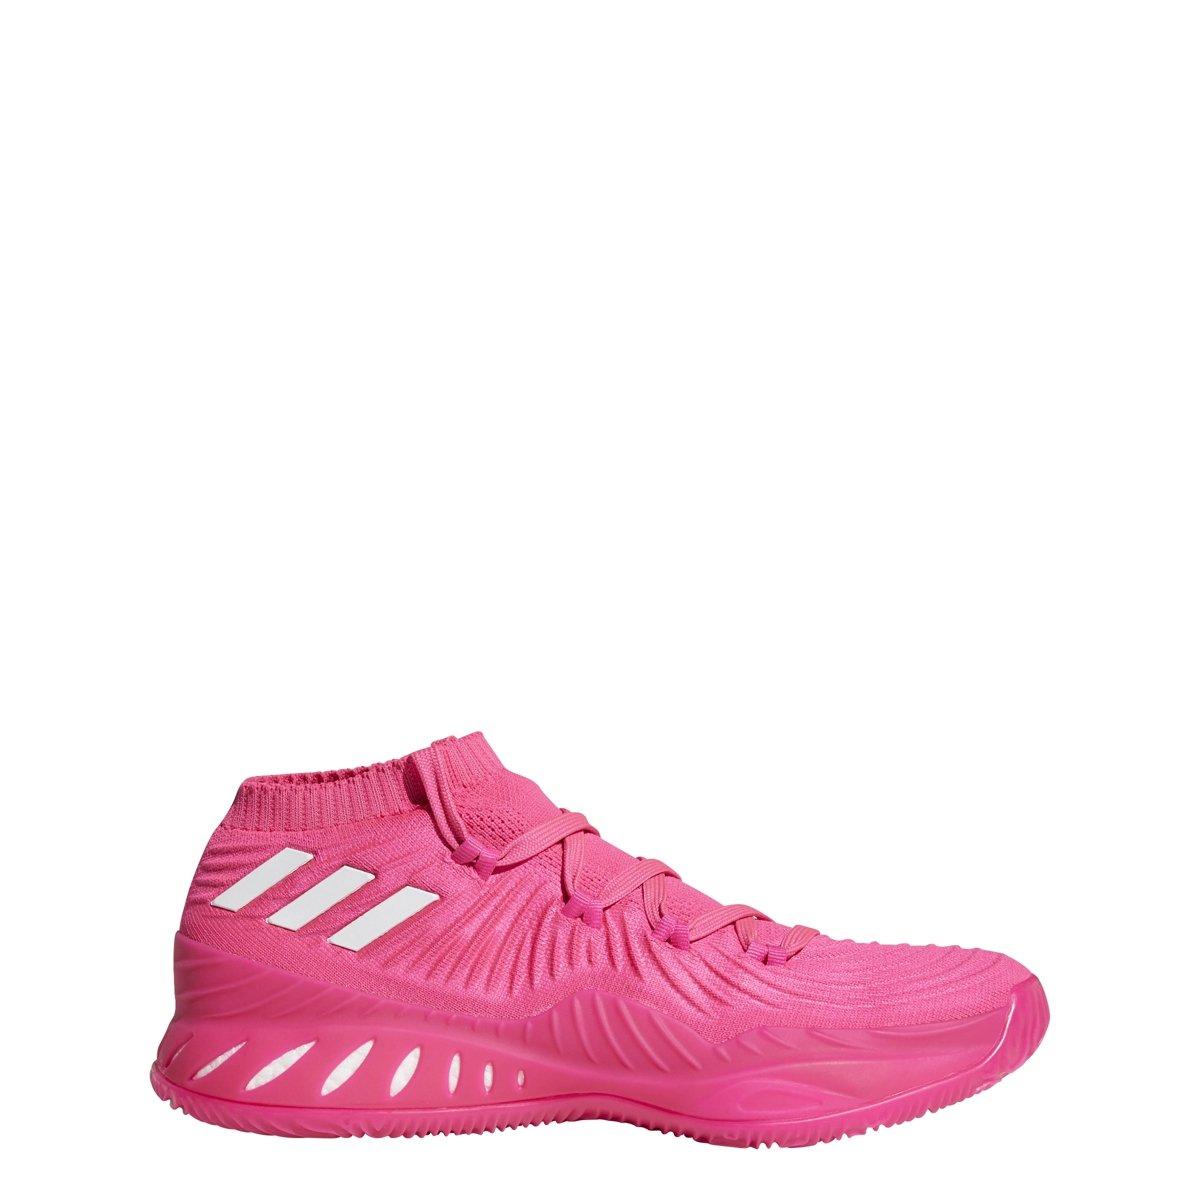 adidas Crazy Explosive Low Shoe Men's Basketball B07B6VFXZN 8.5 D(M) US|Shock Pink-white